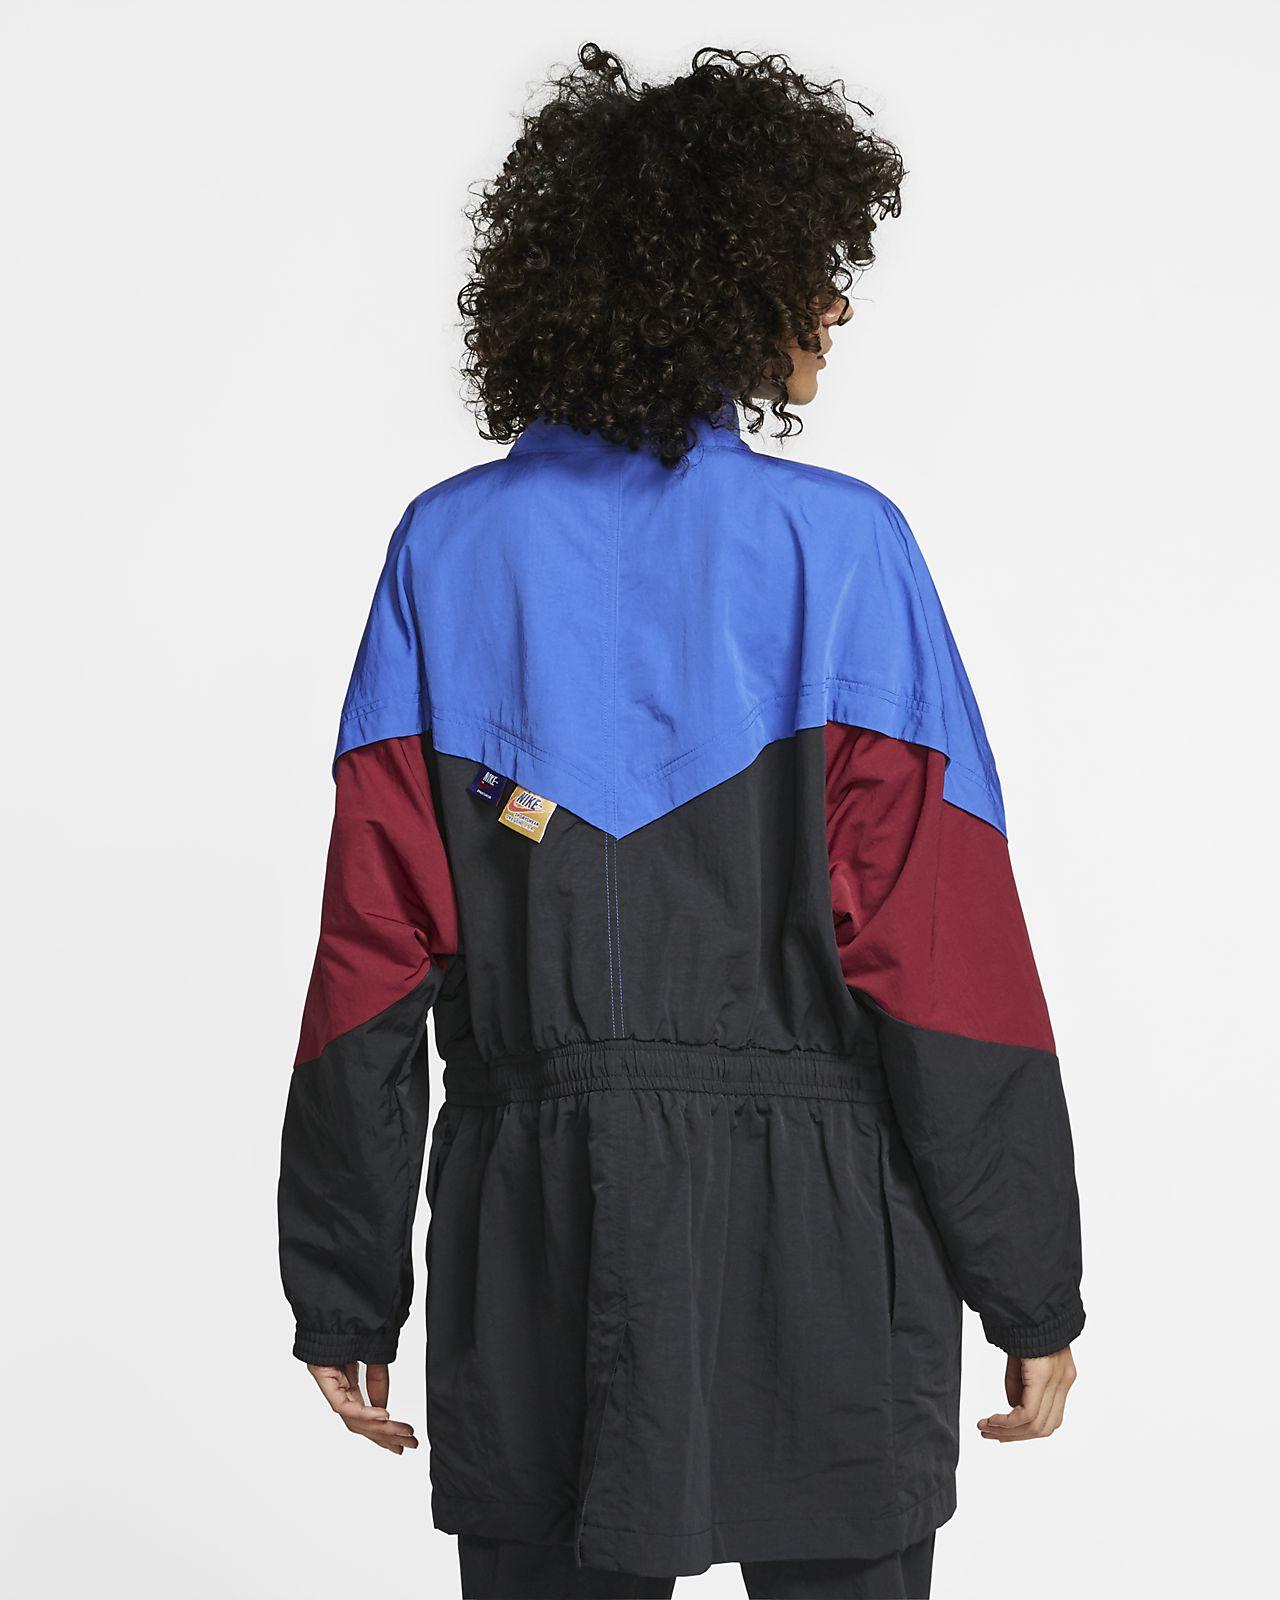 Nike Sportswear Icon Clash Women's Woven Track Jacket. Nike AT